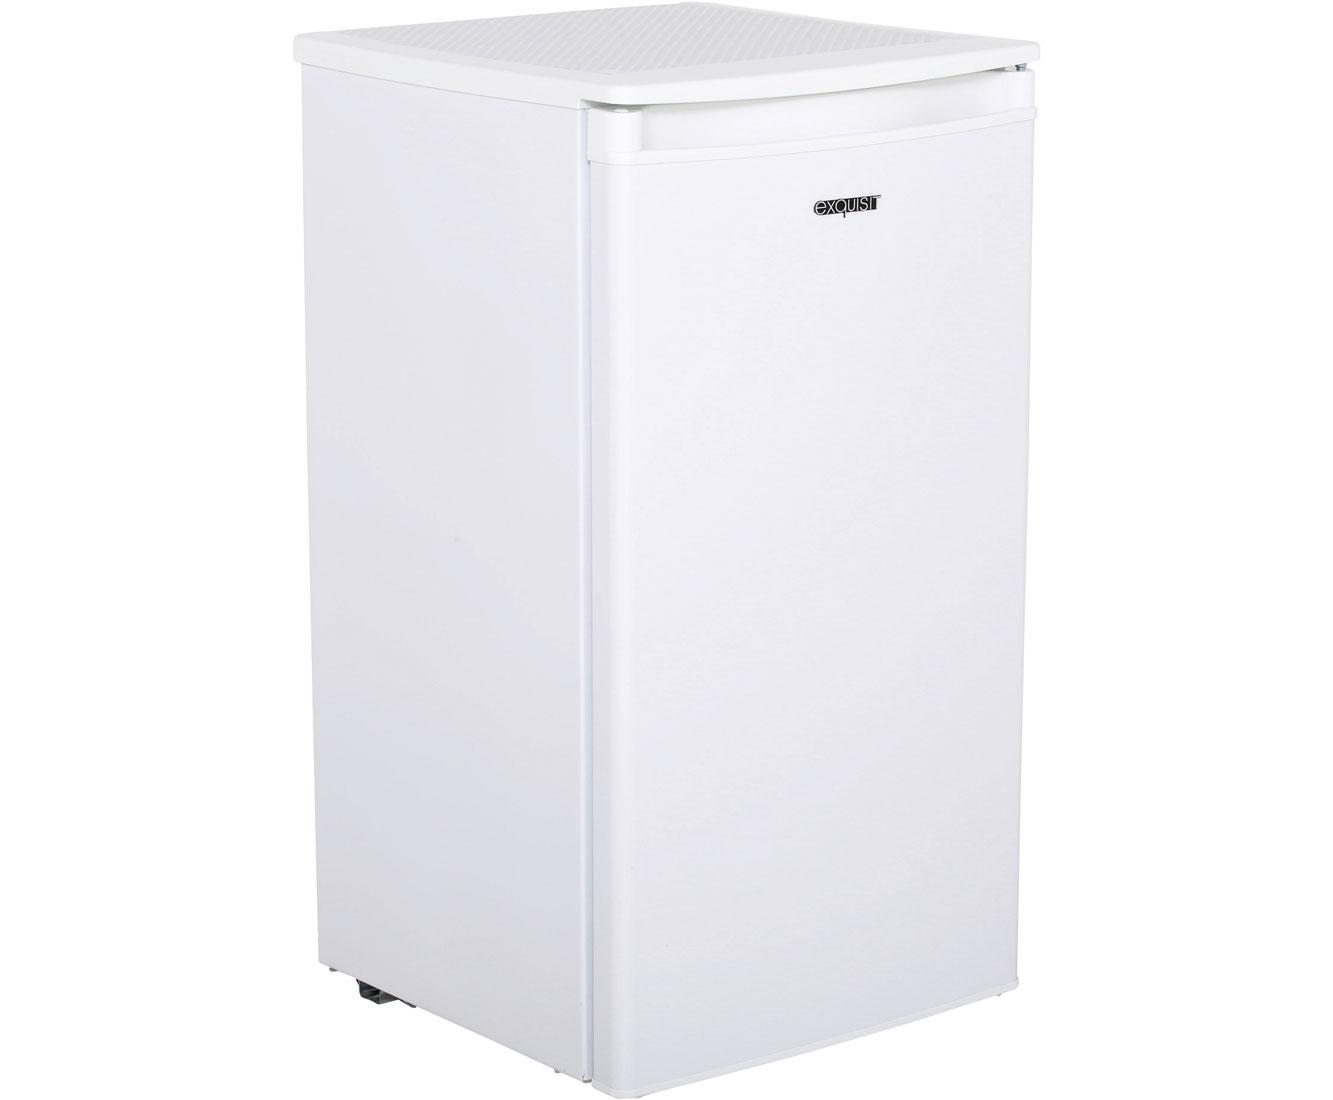 Kühlschrank Weiss : Exquisit ks rva kühlschrank weiß a